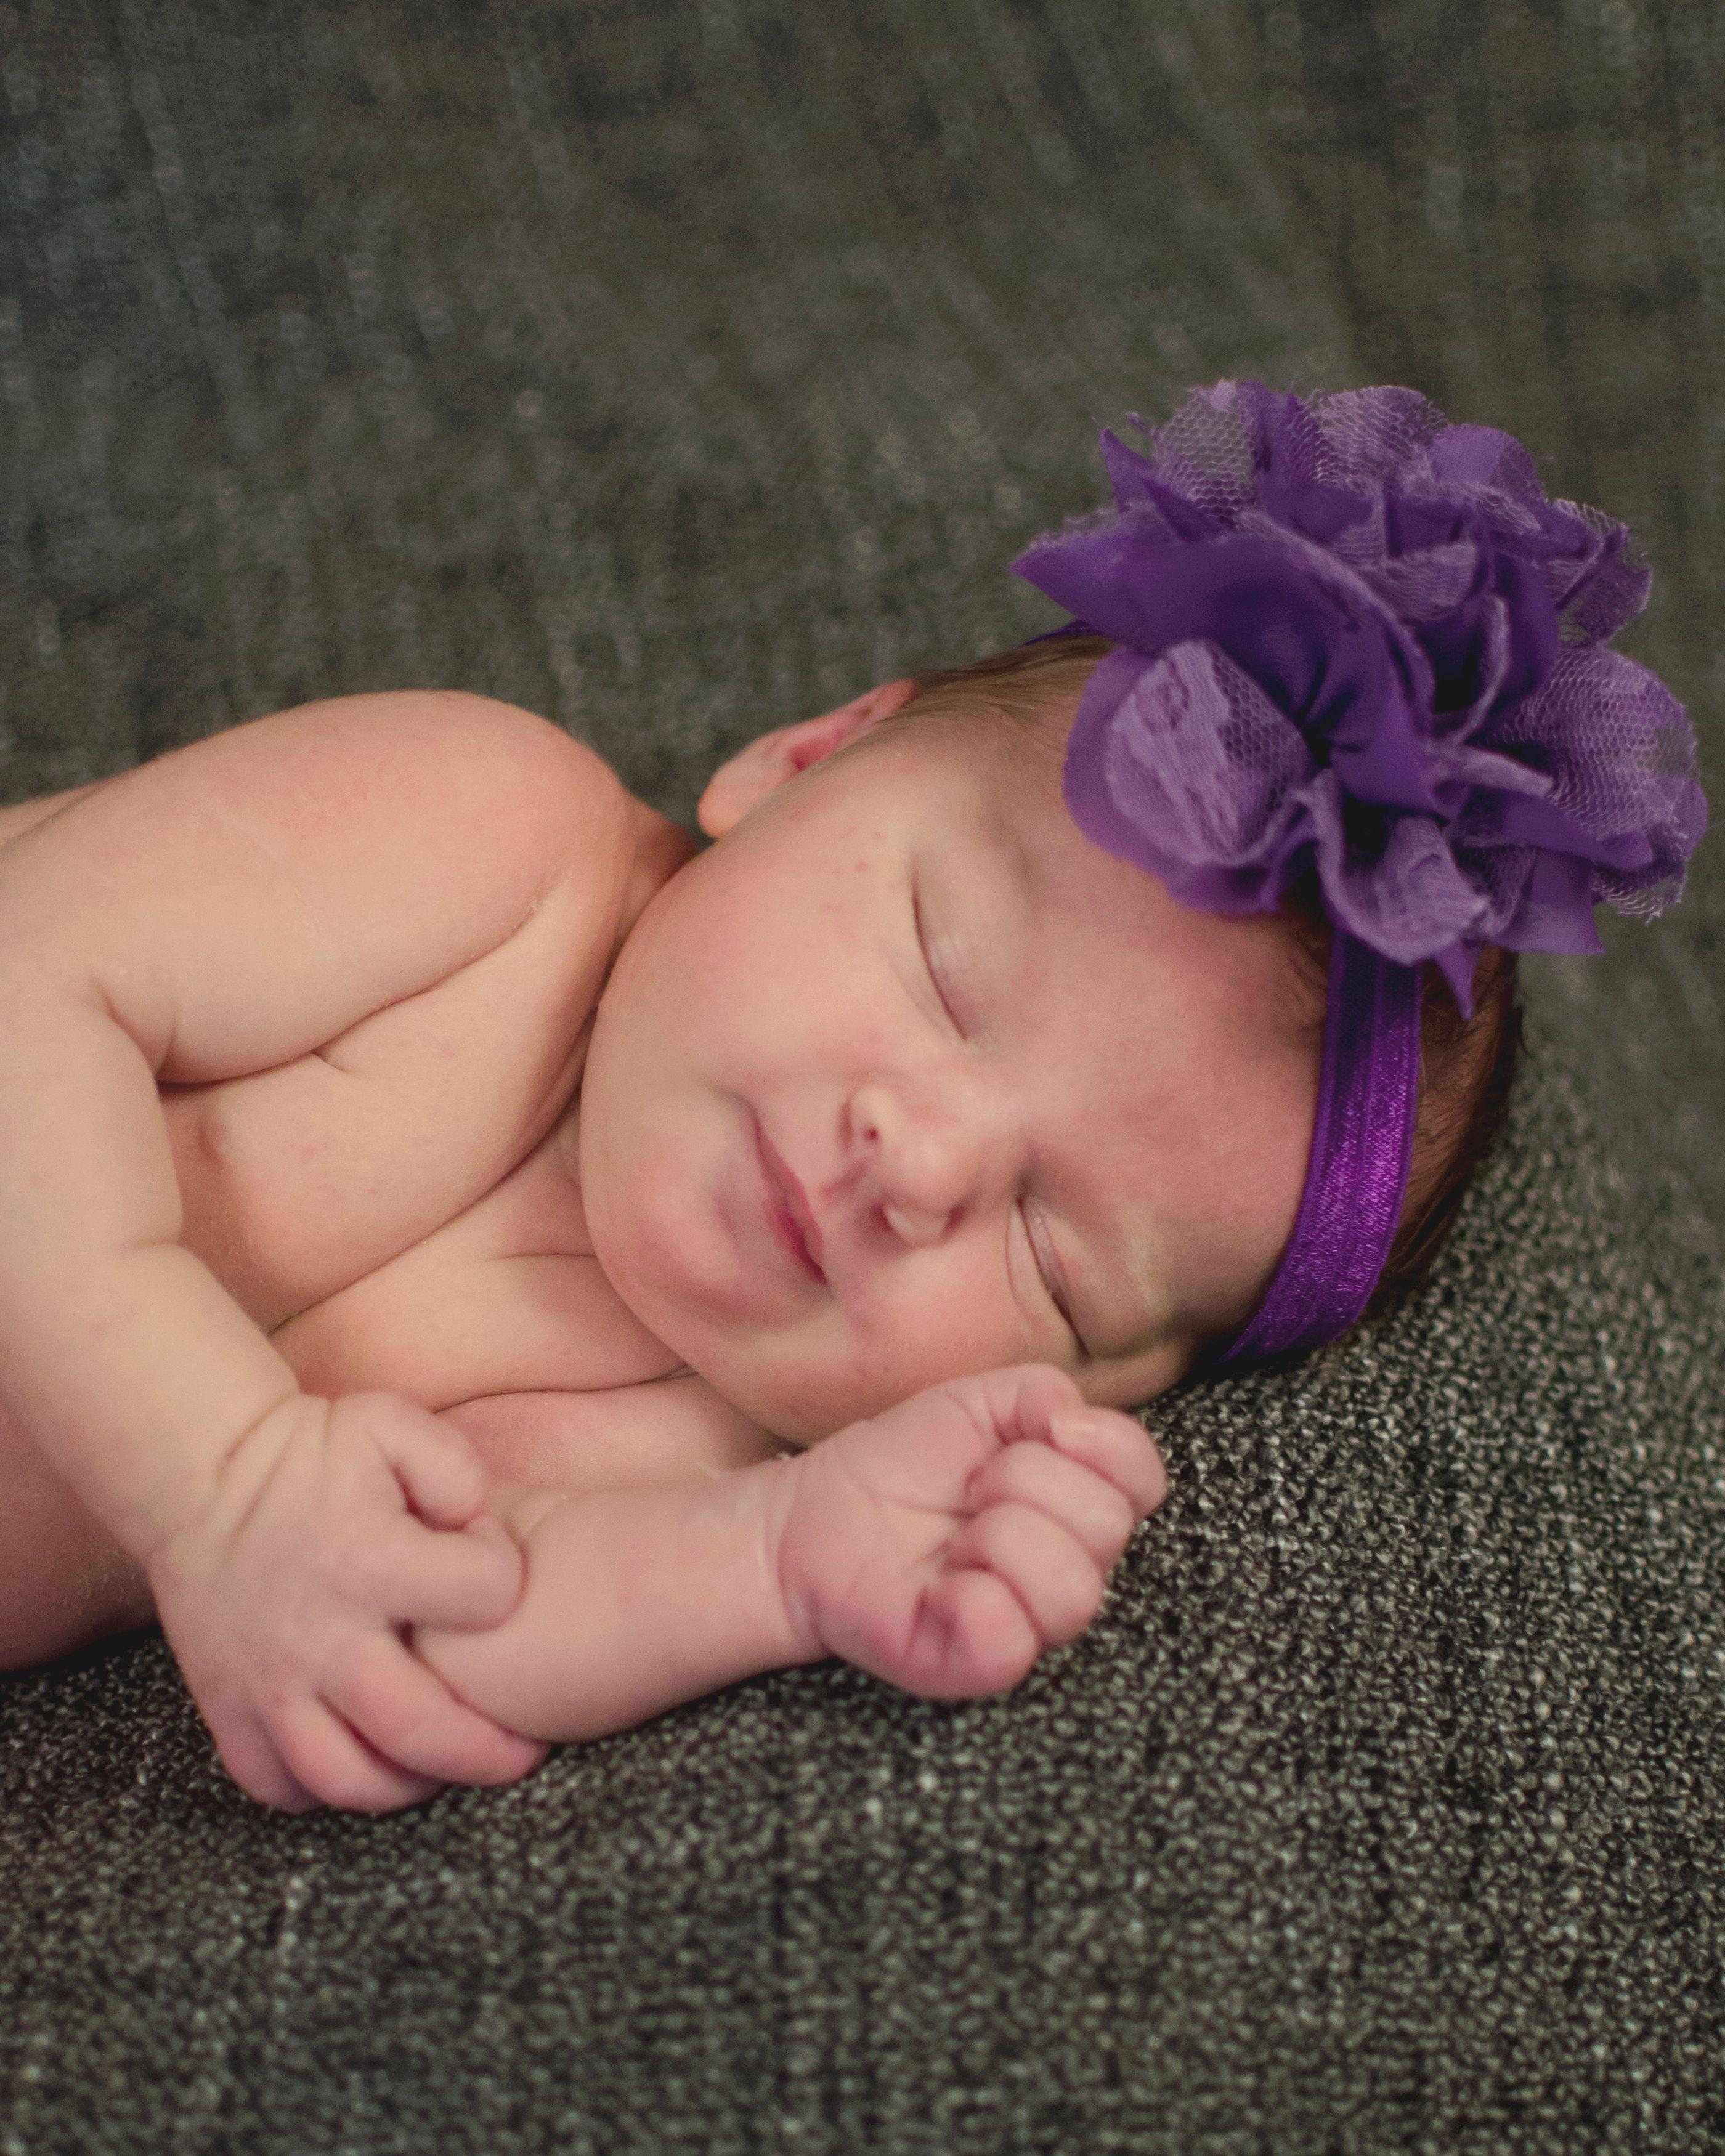 newborn photos at home - YouTube